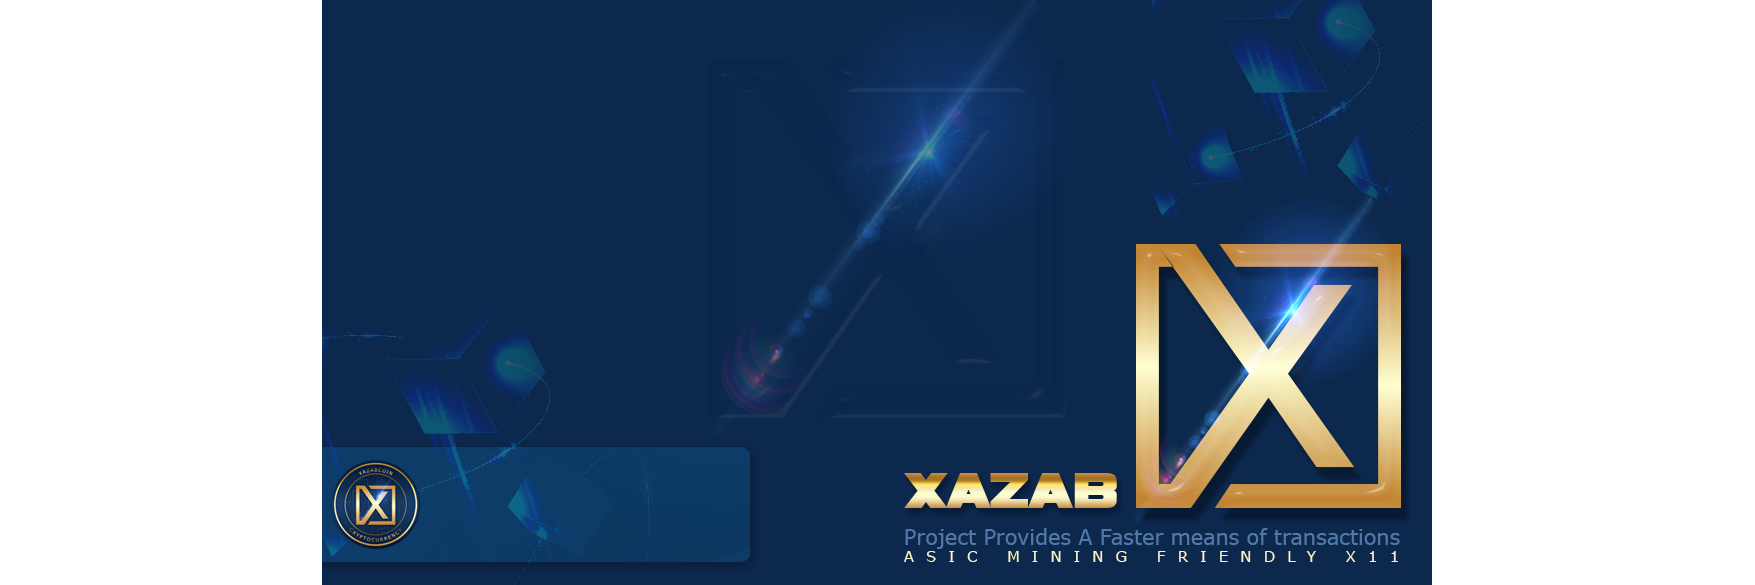 xazabcore banner